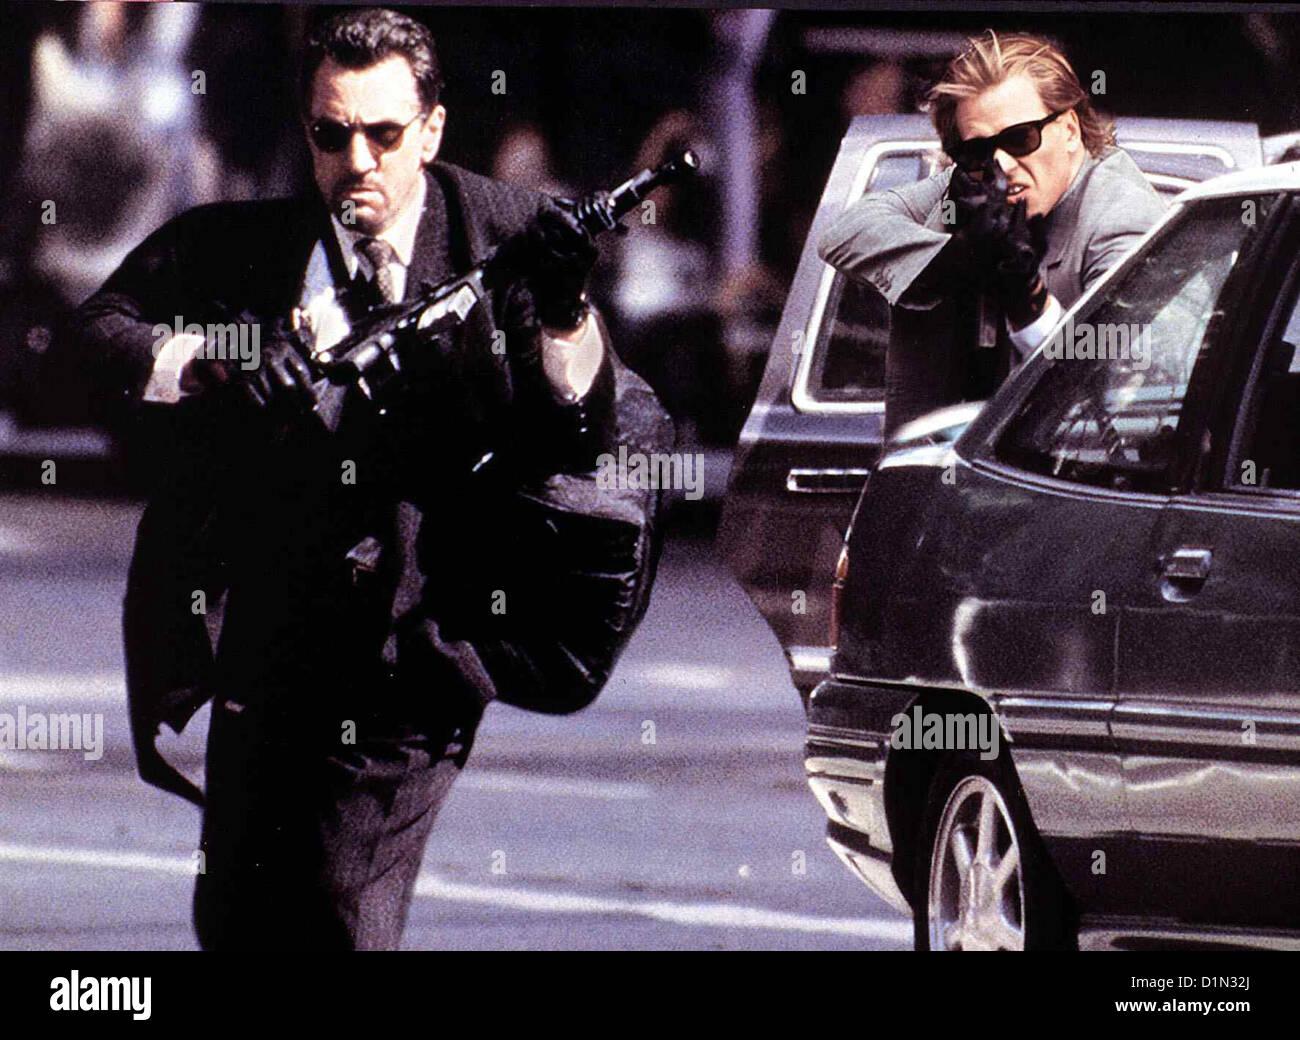 Heat  Heat  Robert De Niro, Val Kilmer McCauley (Robert De Niro,l) ist ein gesuchter Spitzengangster. Gemeinsam mit Chris Stock Photo